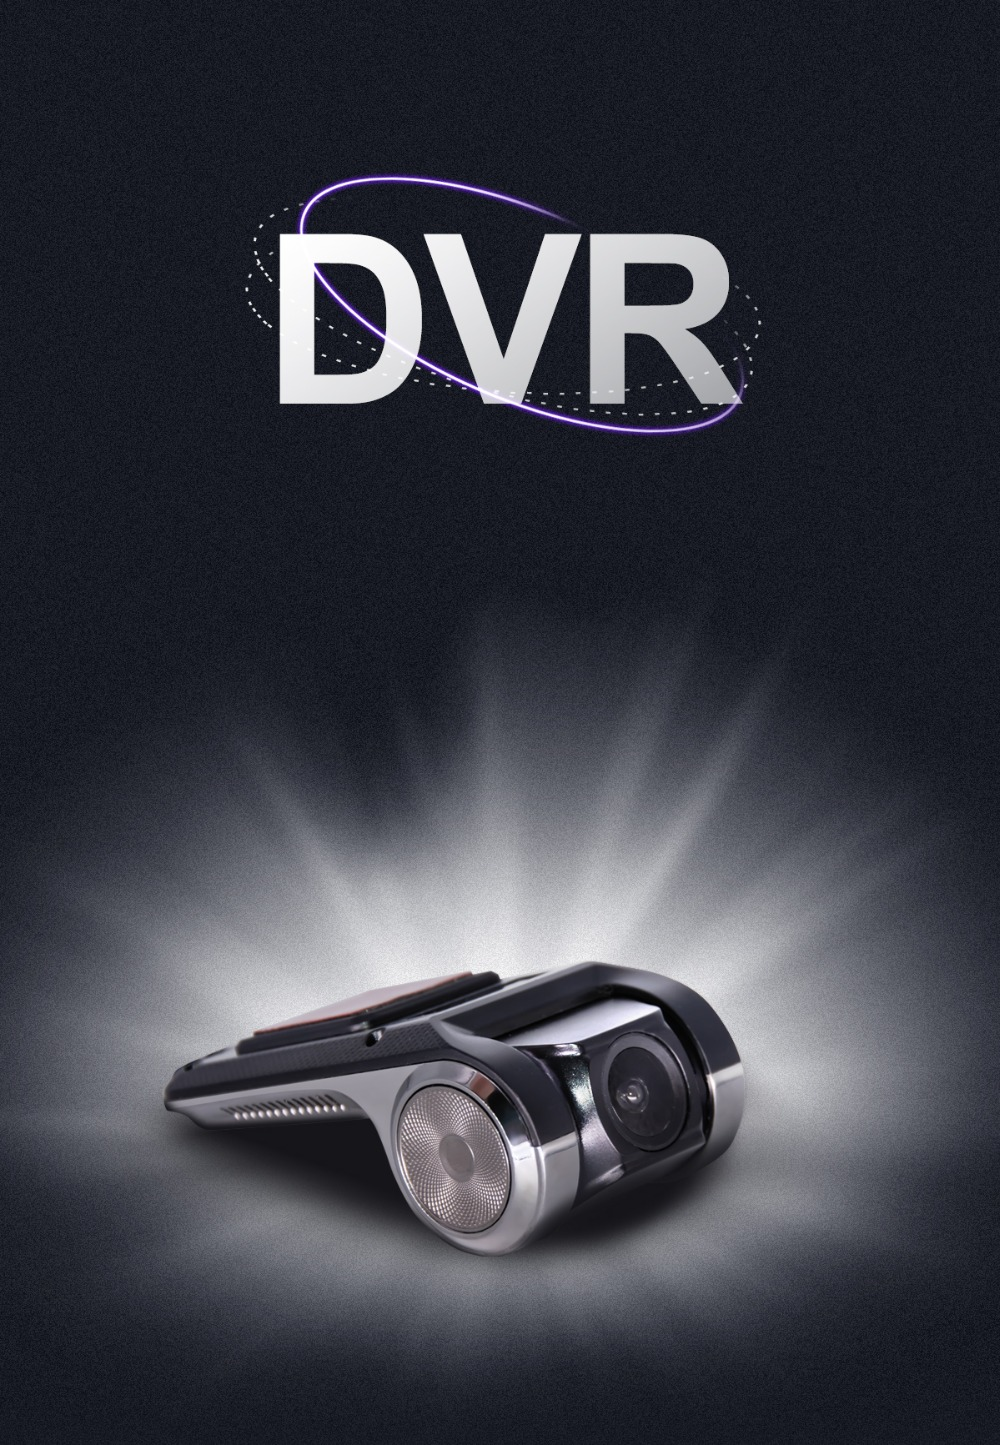 DVR_01